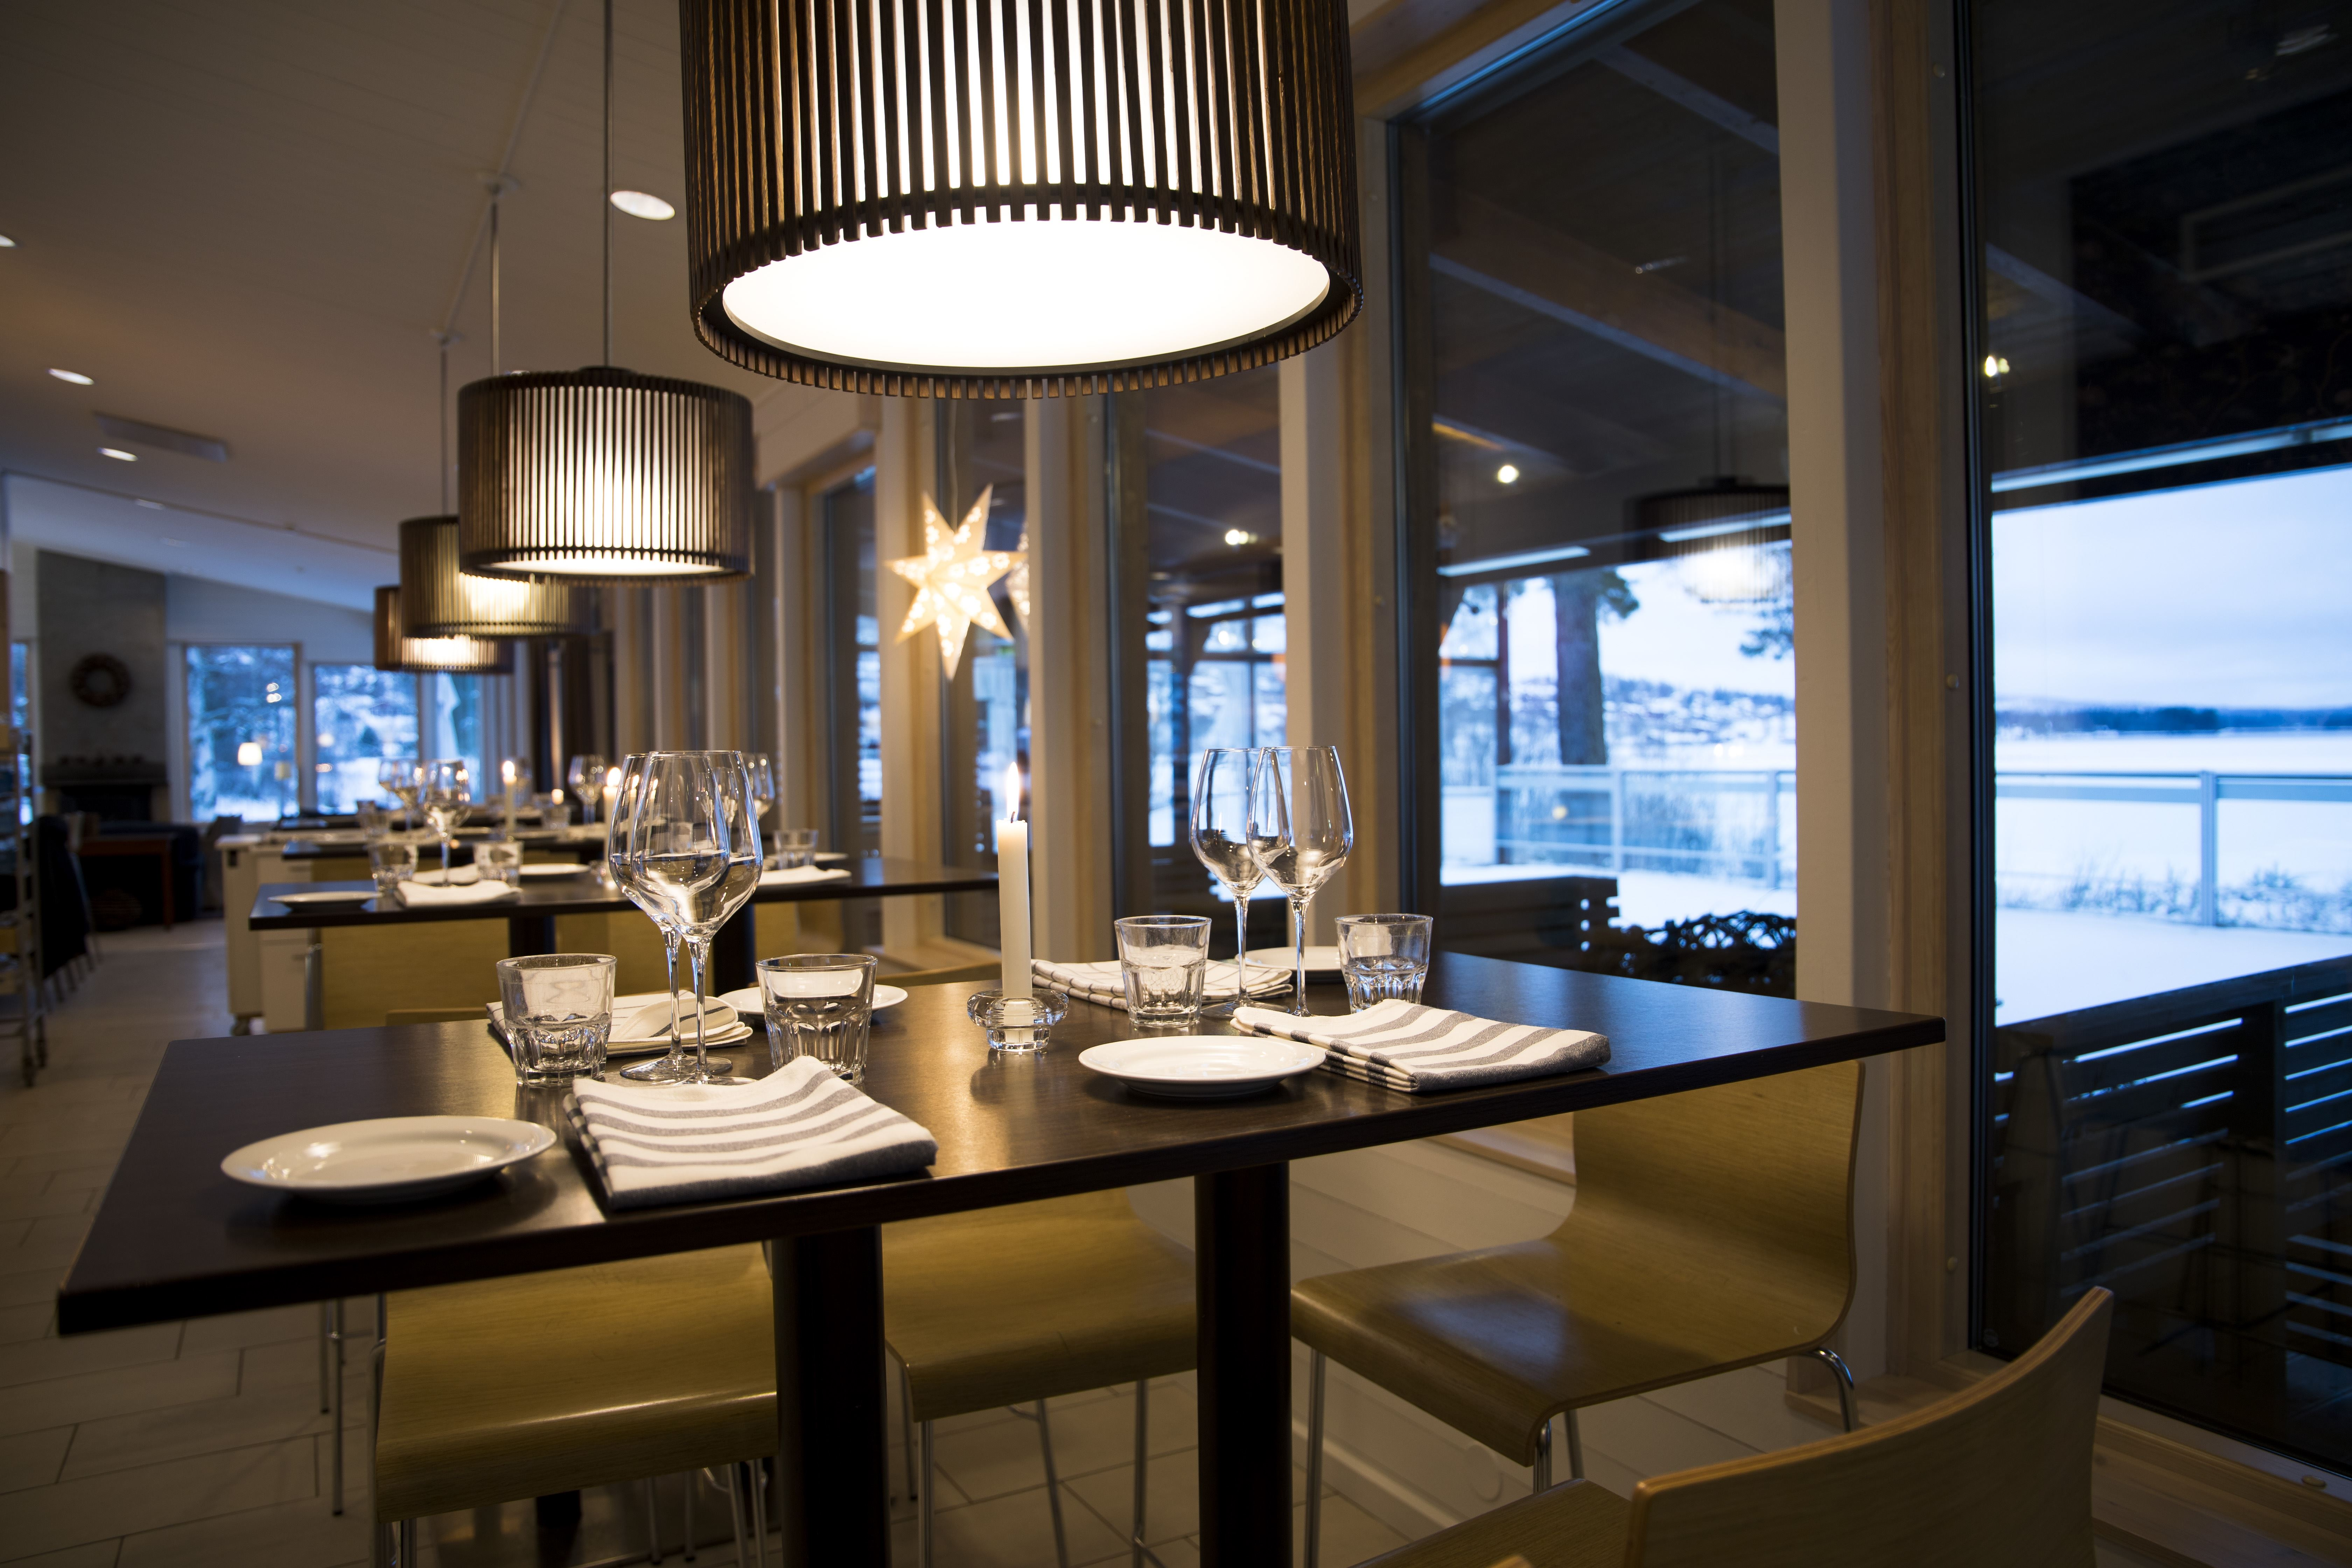 Visit Sjövillan - Brasserie & Bar